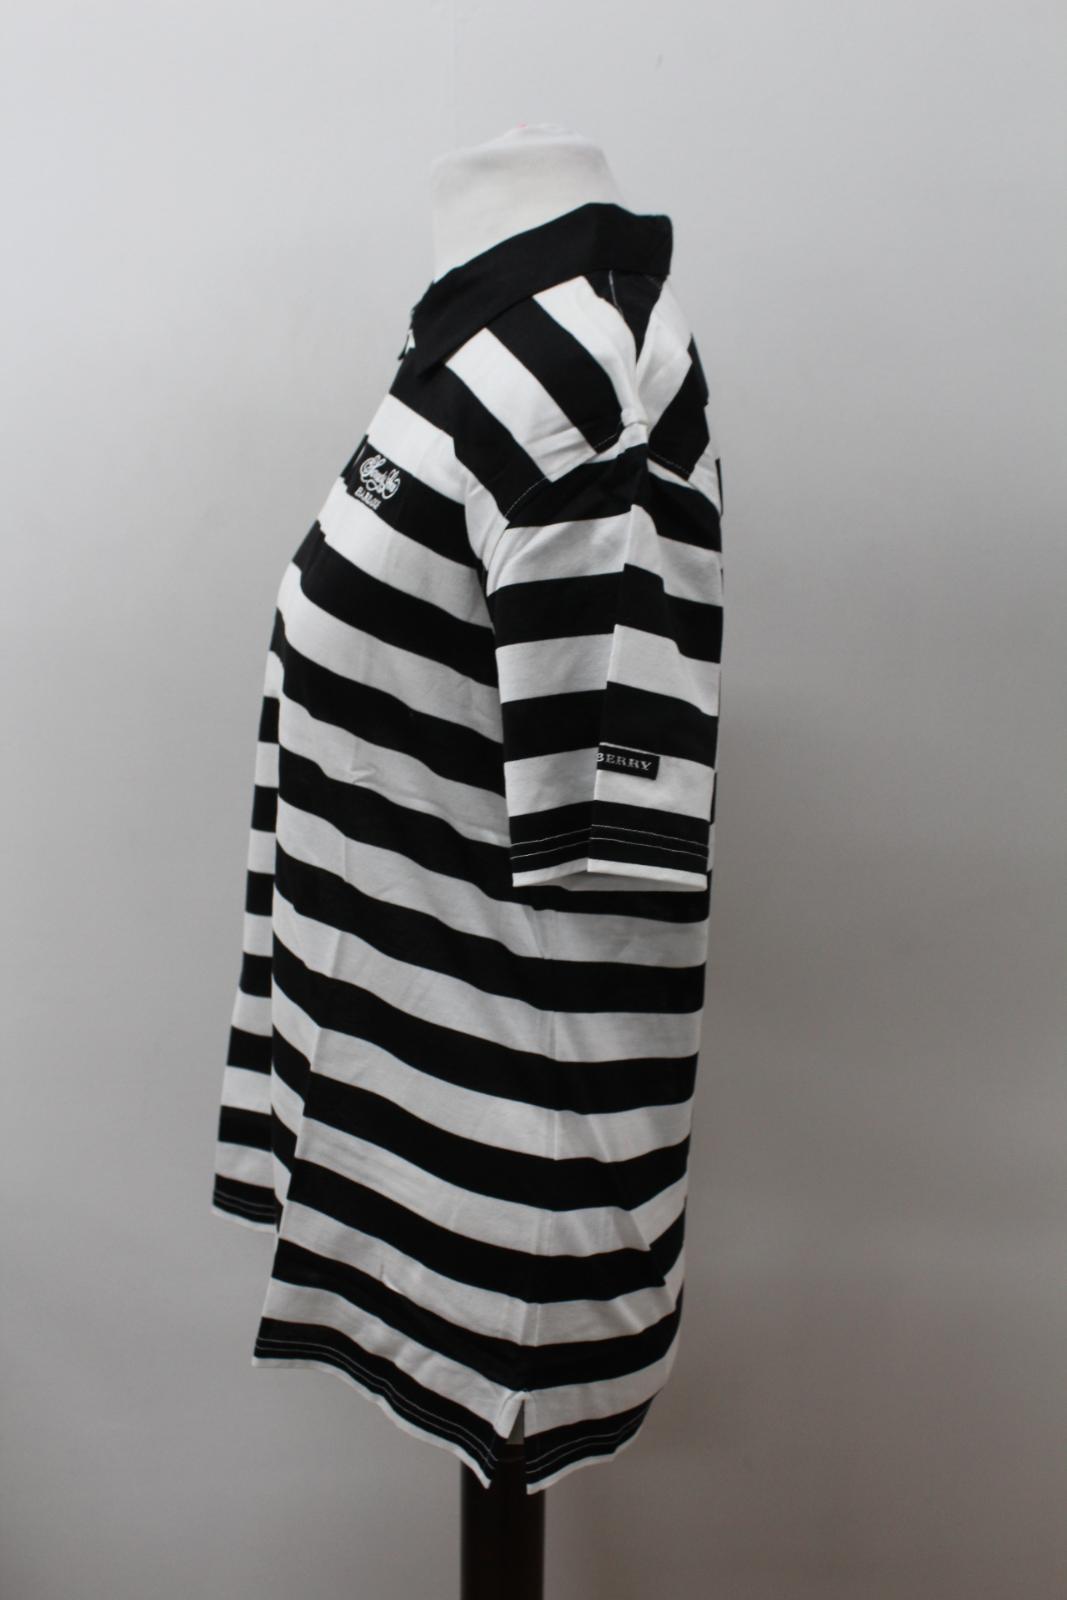 BURBERRY-GOLF-Ladies-Black-White-Cotton-Short-Sleeve-Striped-Polo-Shirt-S-BNWT thumbnail 6